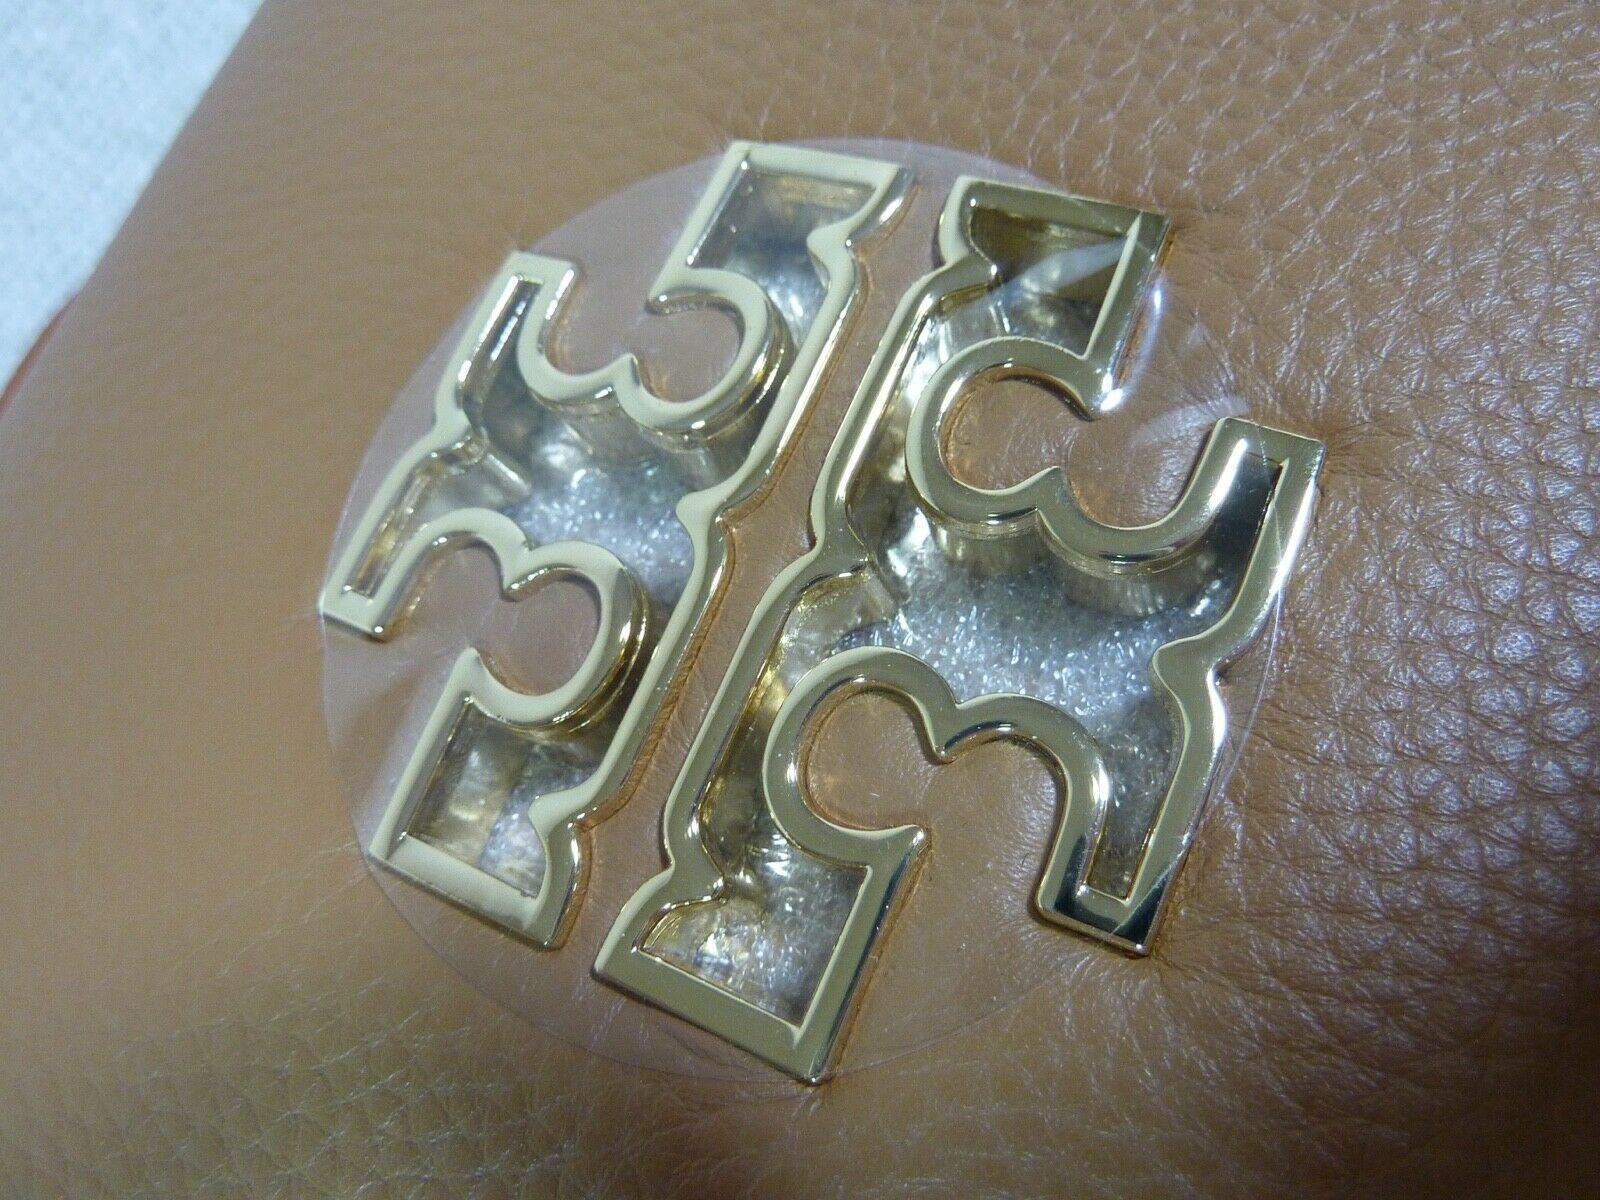 NWT Tory Burch Bark Leather Britten Combo Cross Body bag/Clutch  - $425 image 8